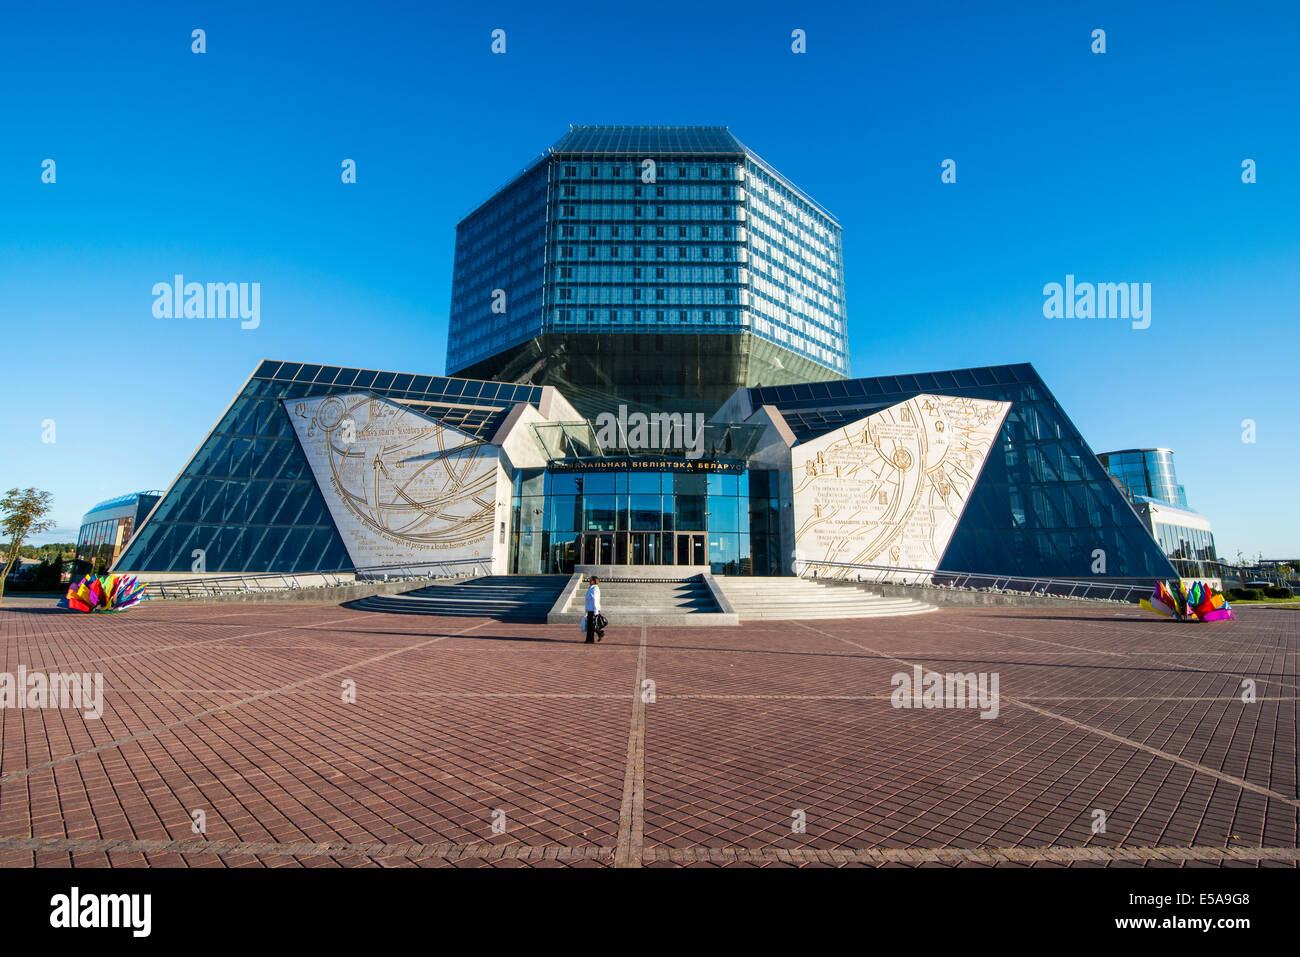 National Library of Belarus, Minsk, Belarus Stock Photo